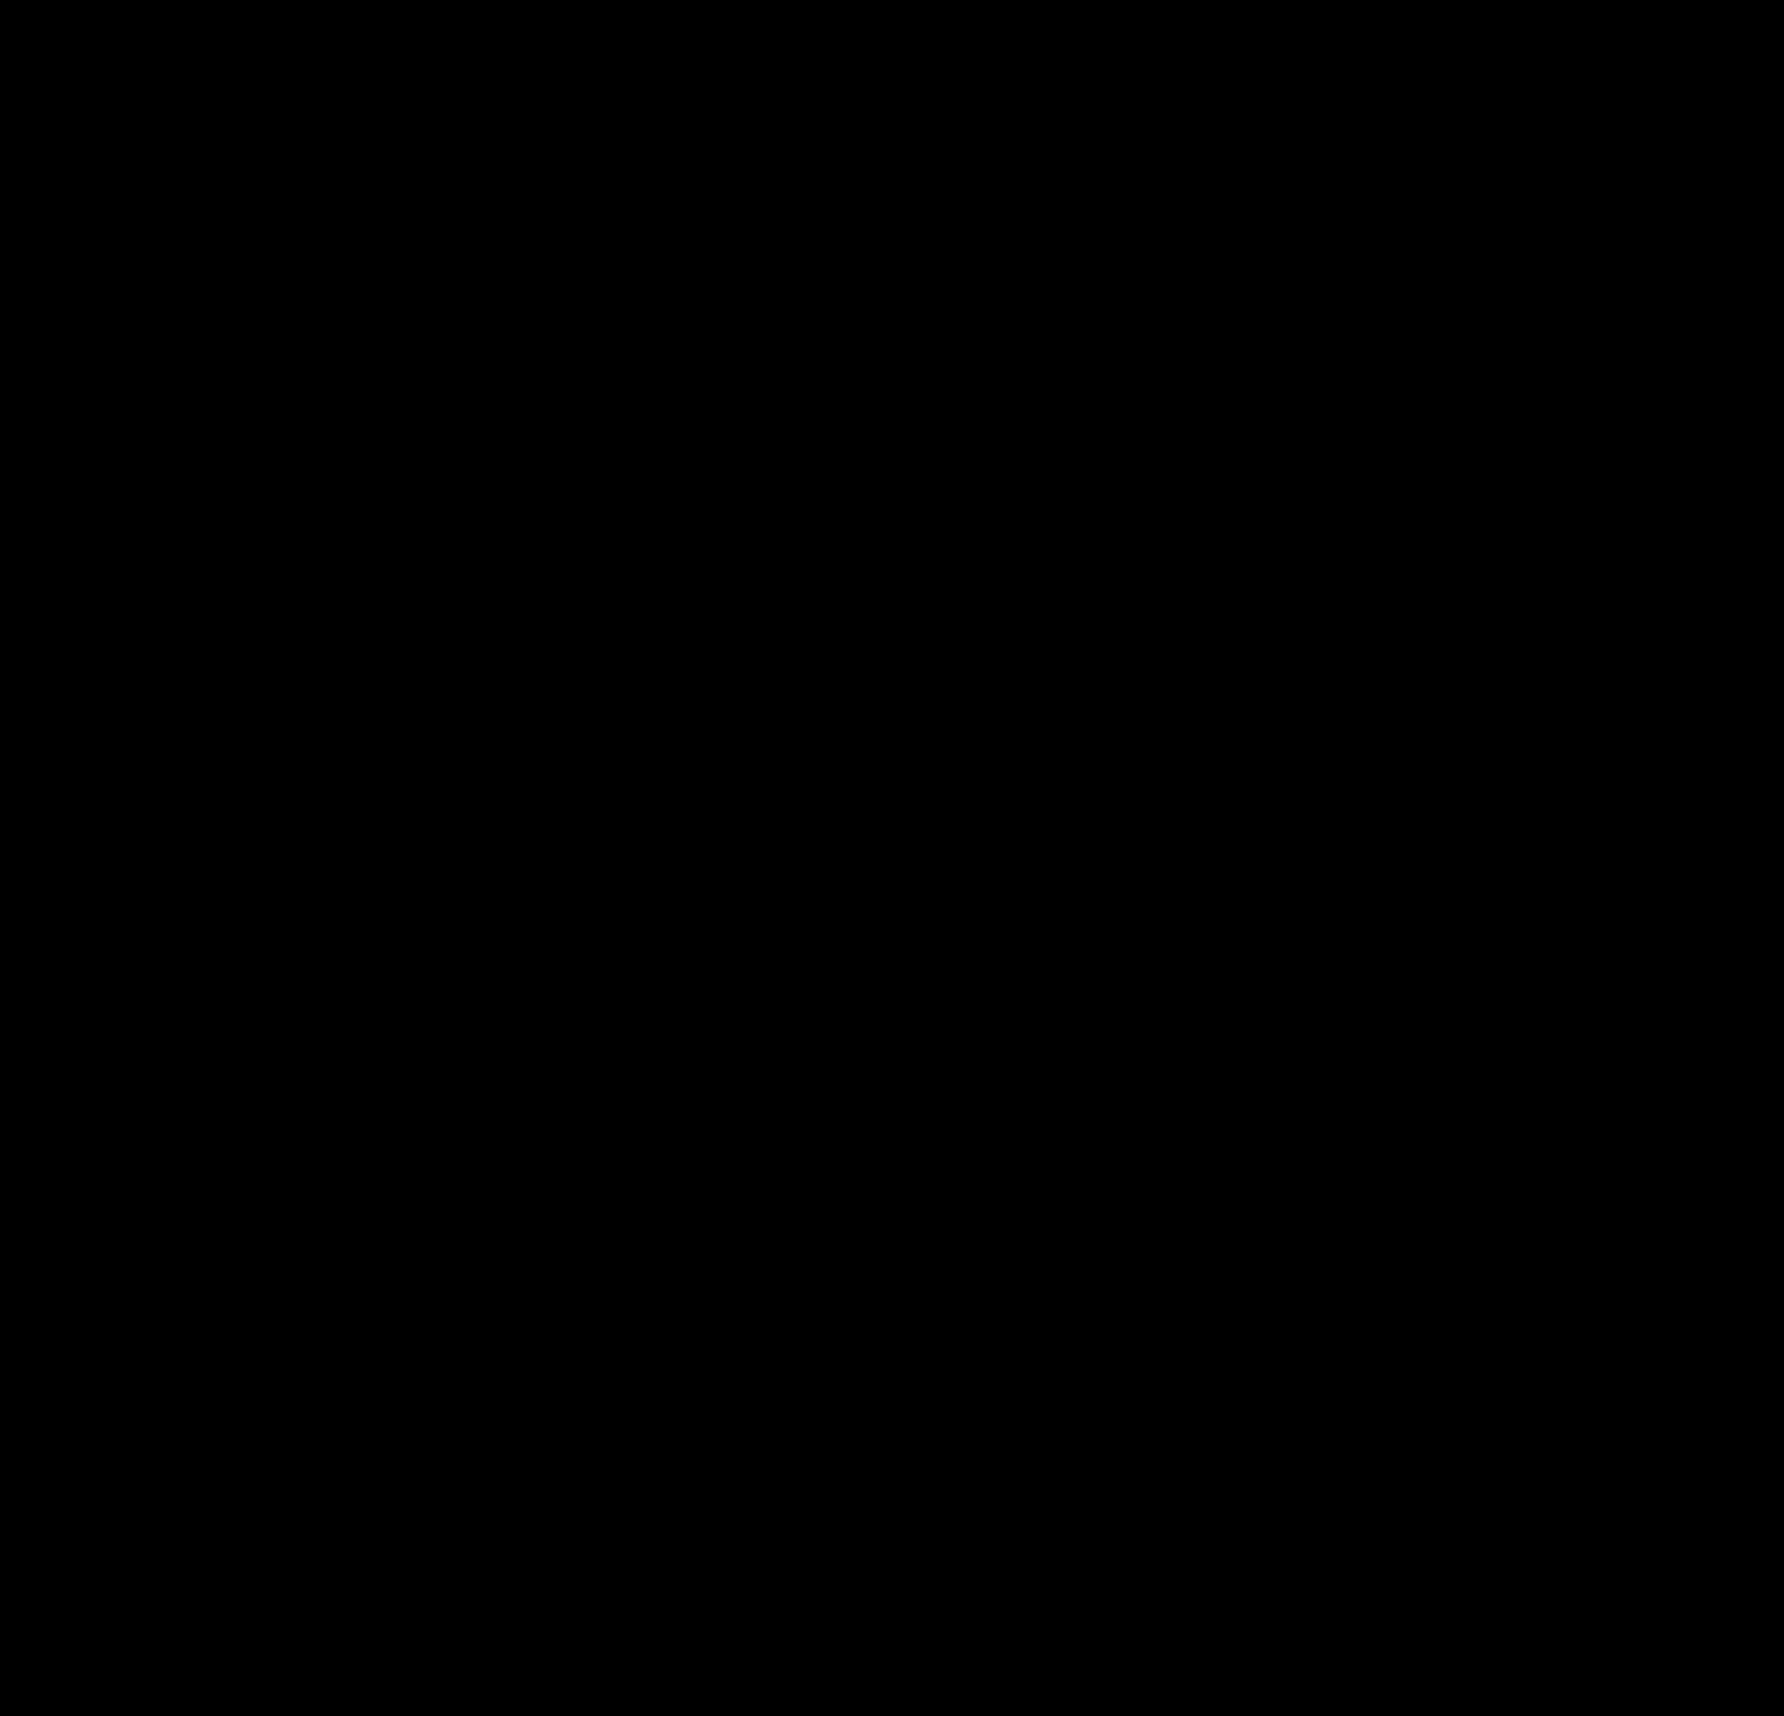 clip art black and white stock Transparent wreath. Portable network graphics clip